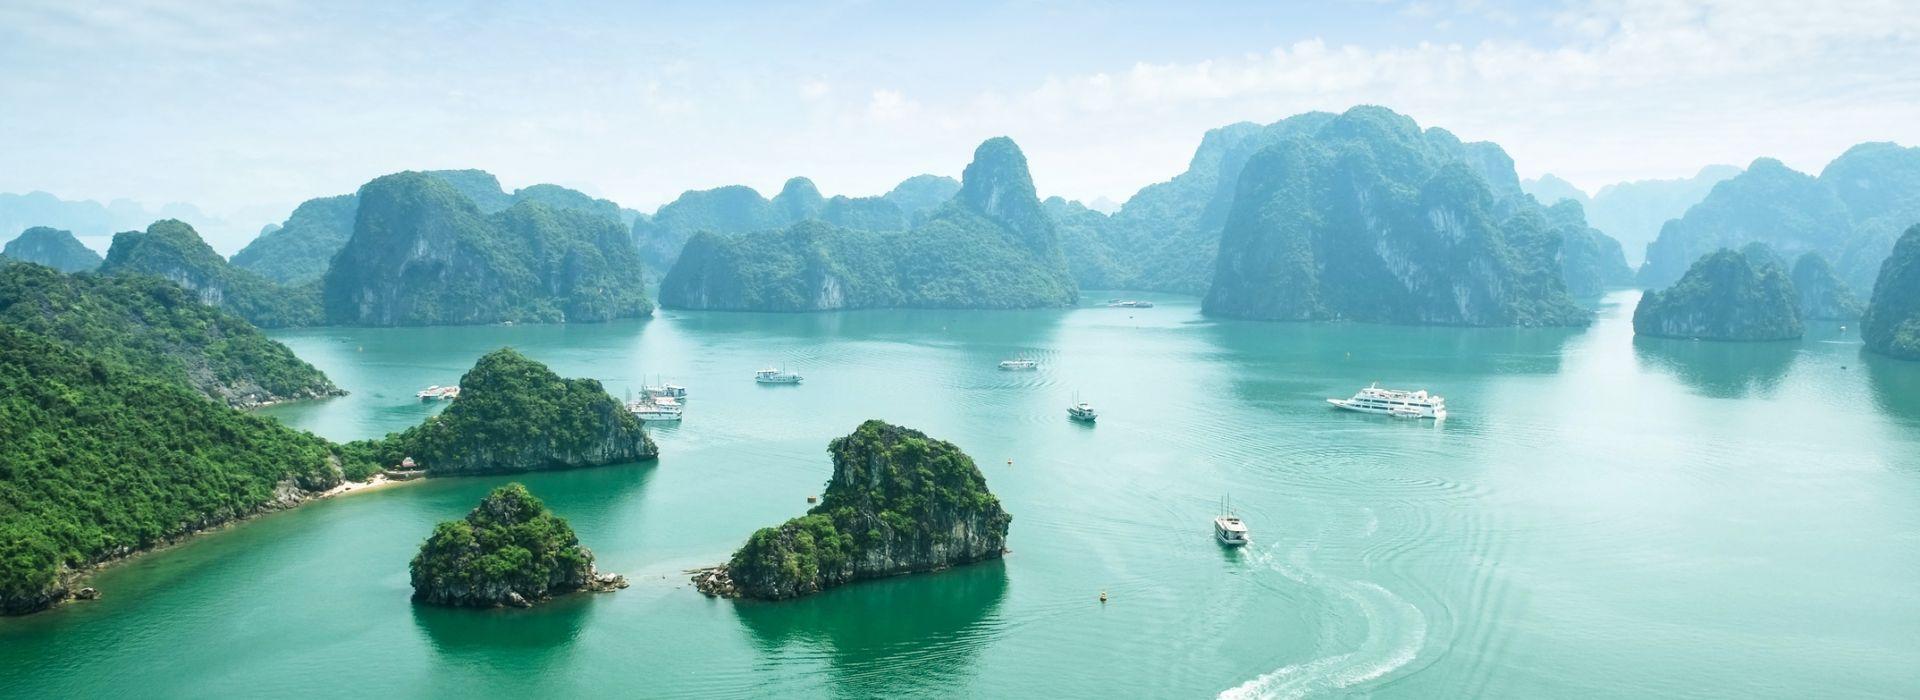 Spas Tours in Vietnam